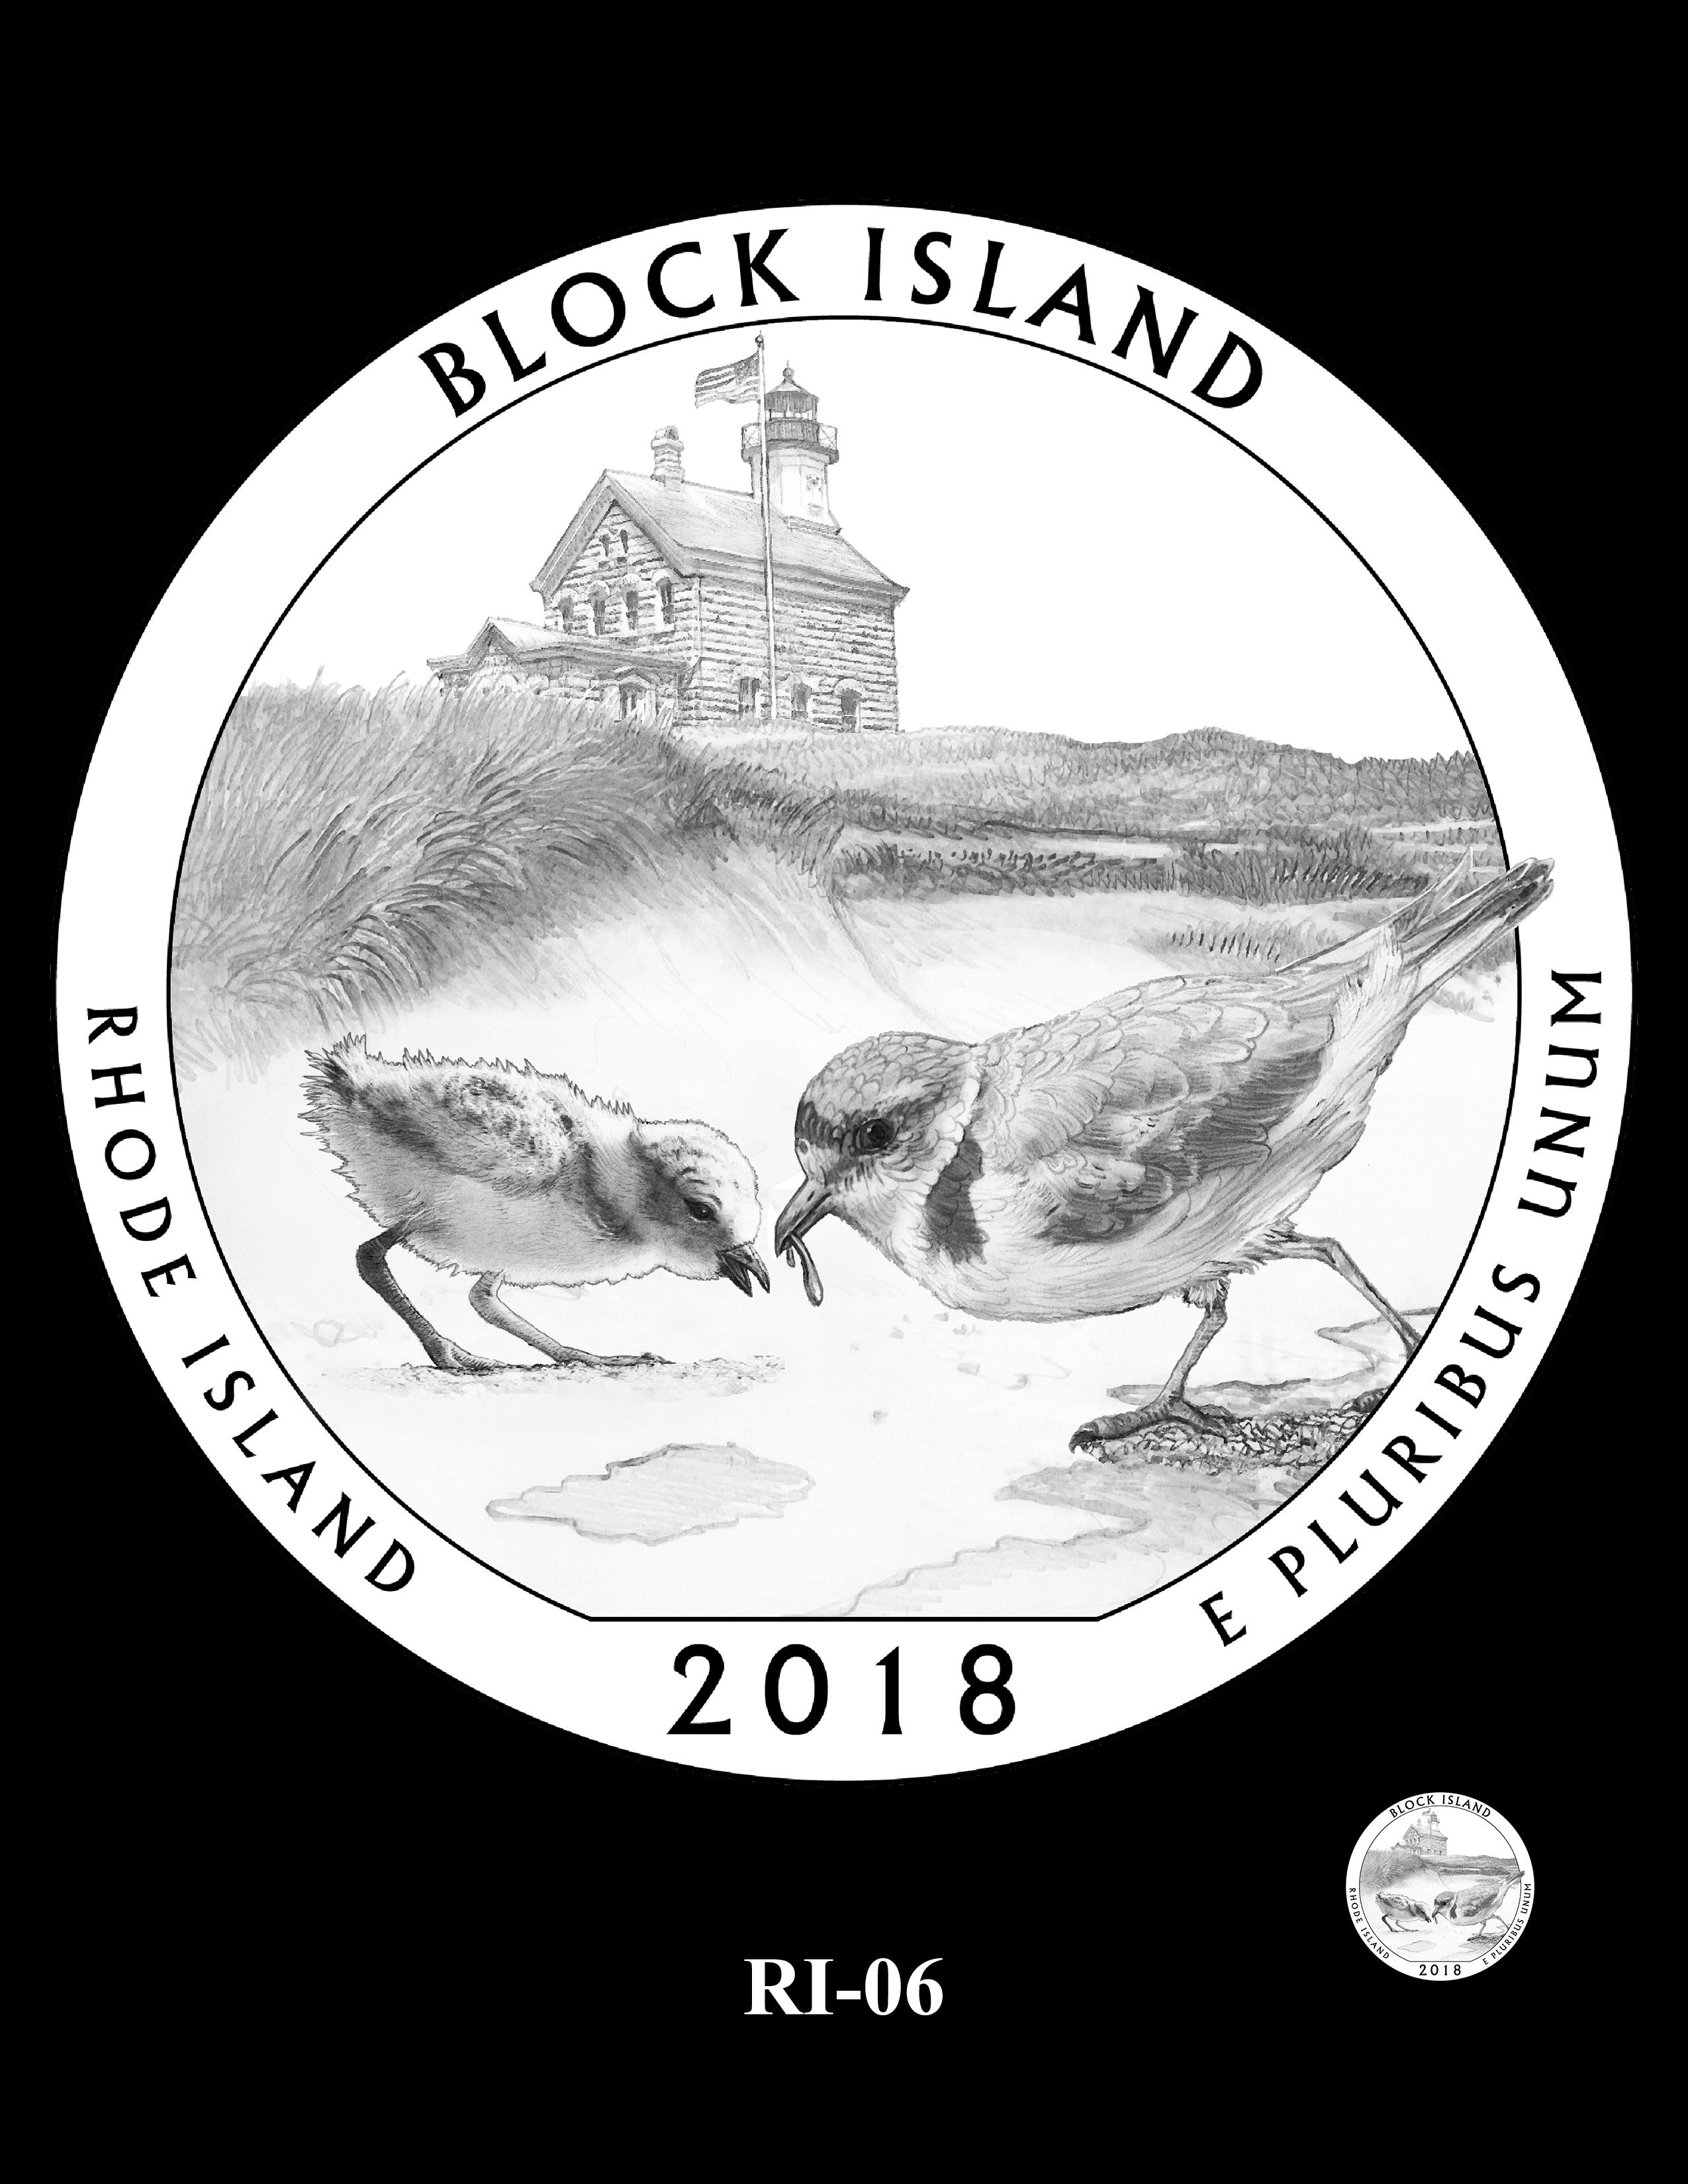 RI-06 -- 2018 America the Beautiful® Quarters Program